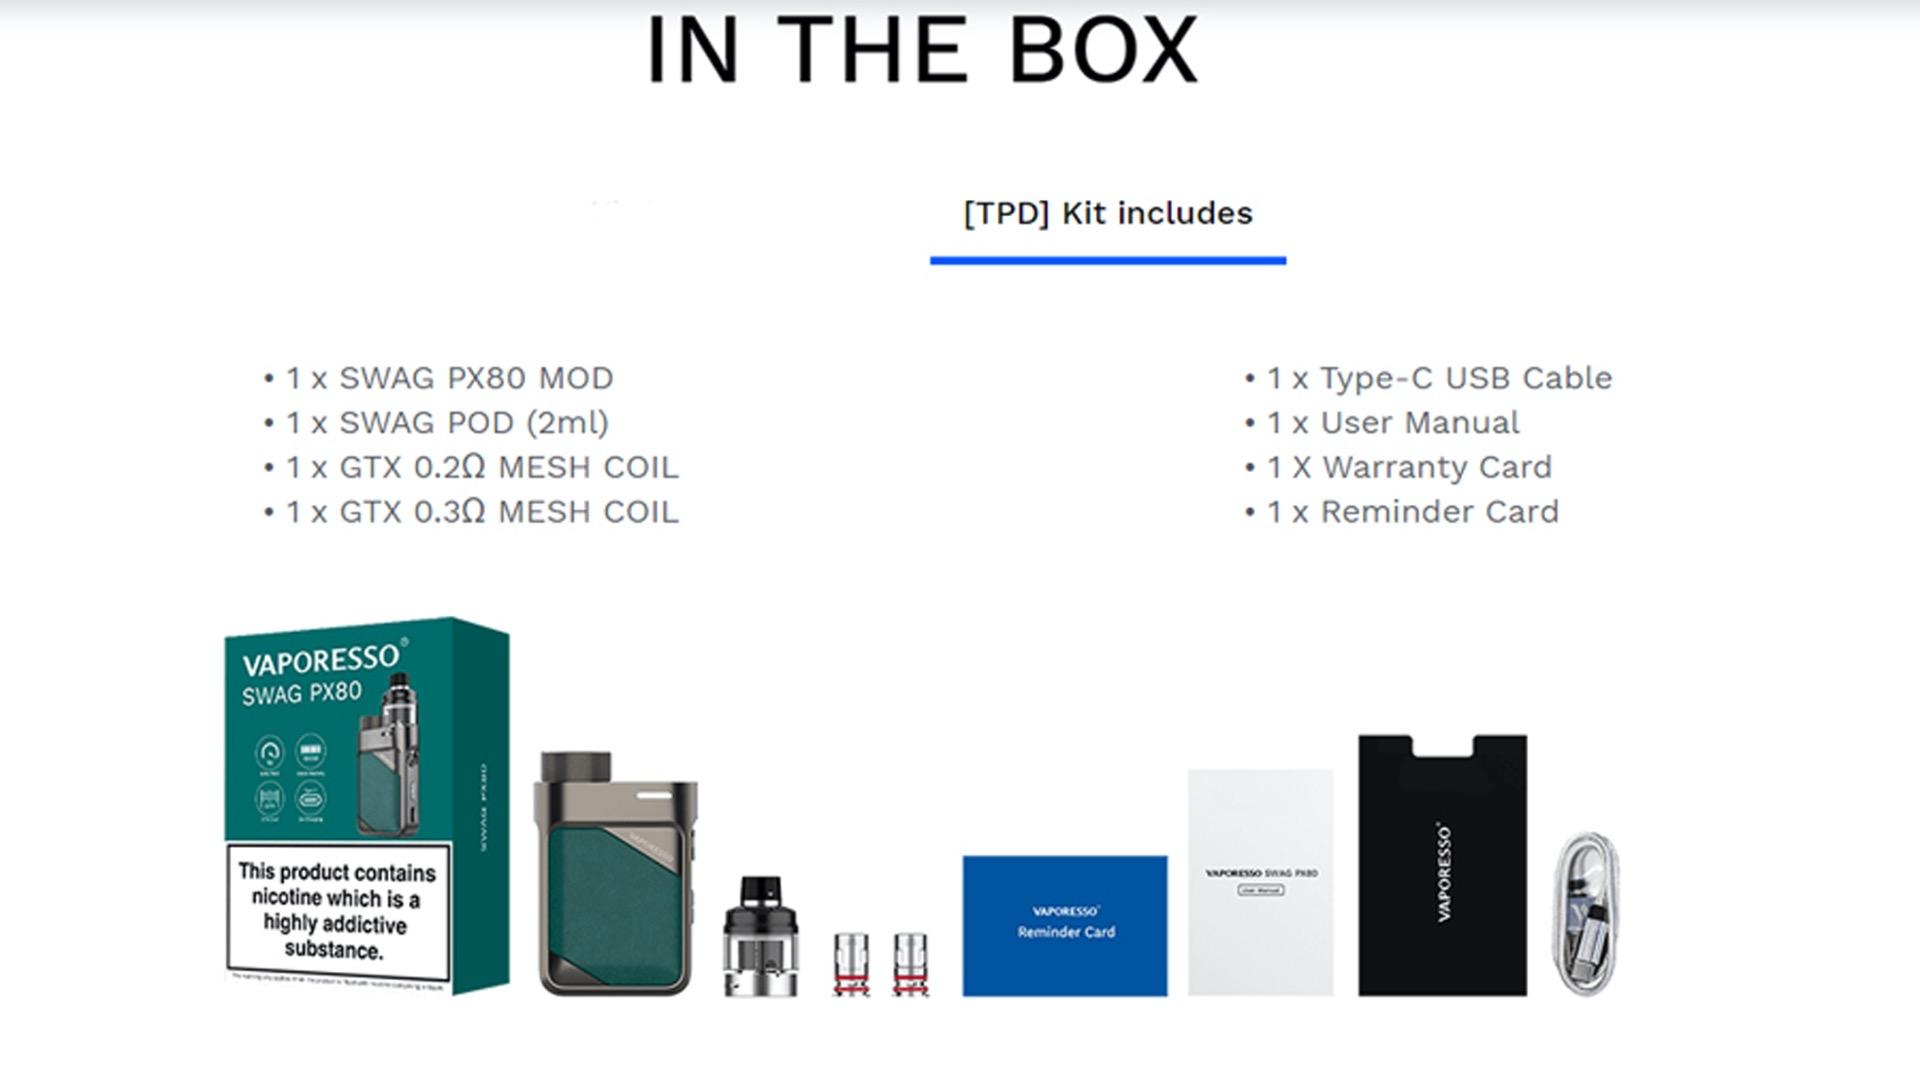 Vaporesso SWAG PX8o in the box